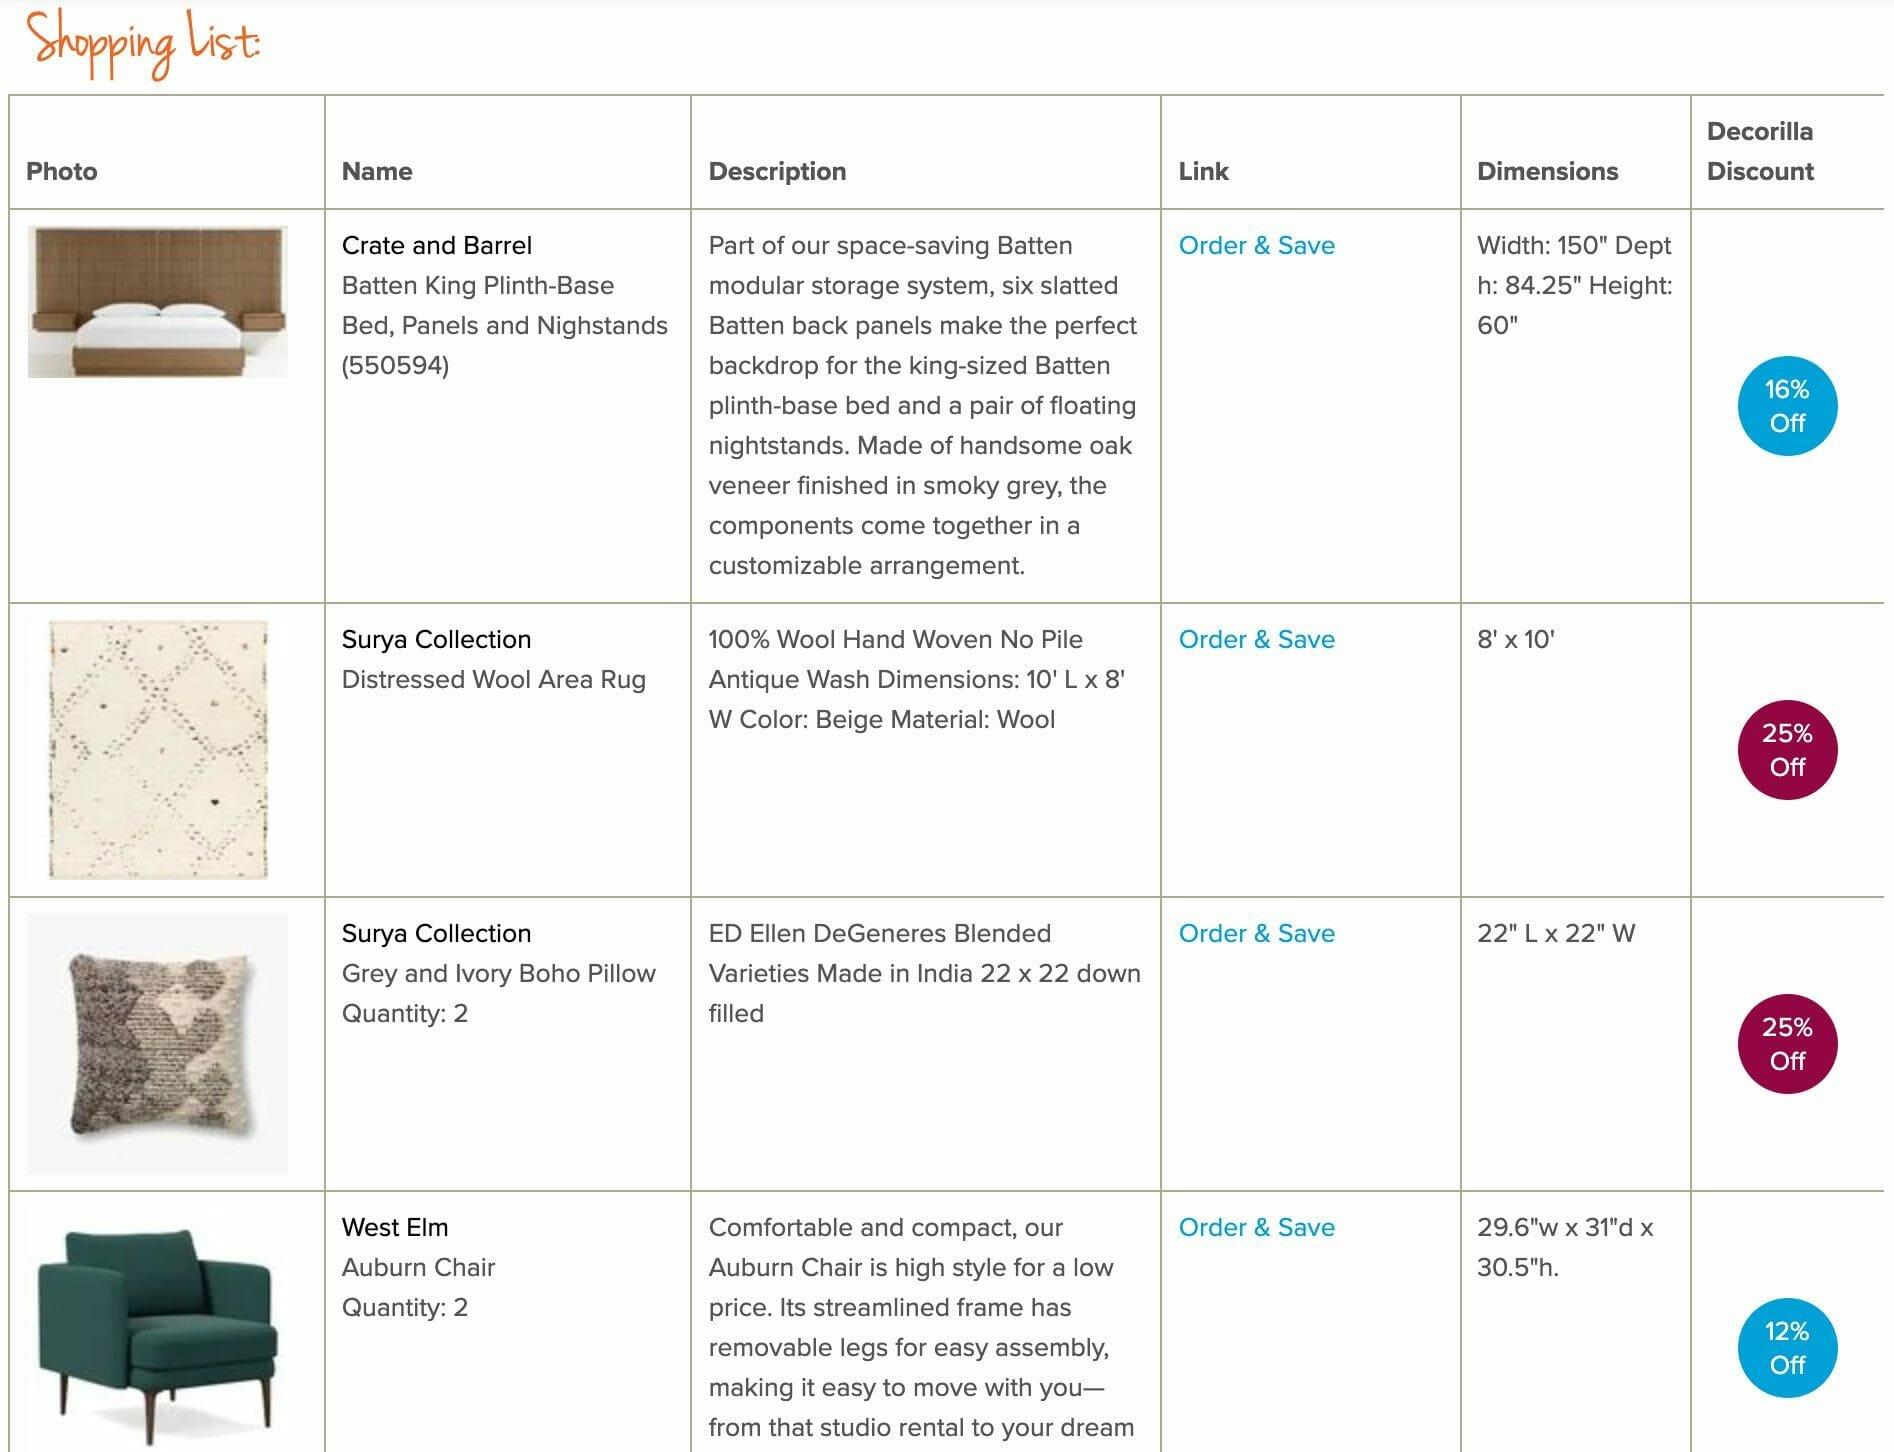 Decorilla Virtual Interior Design Shopping List